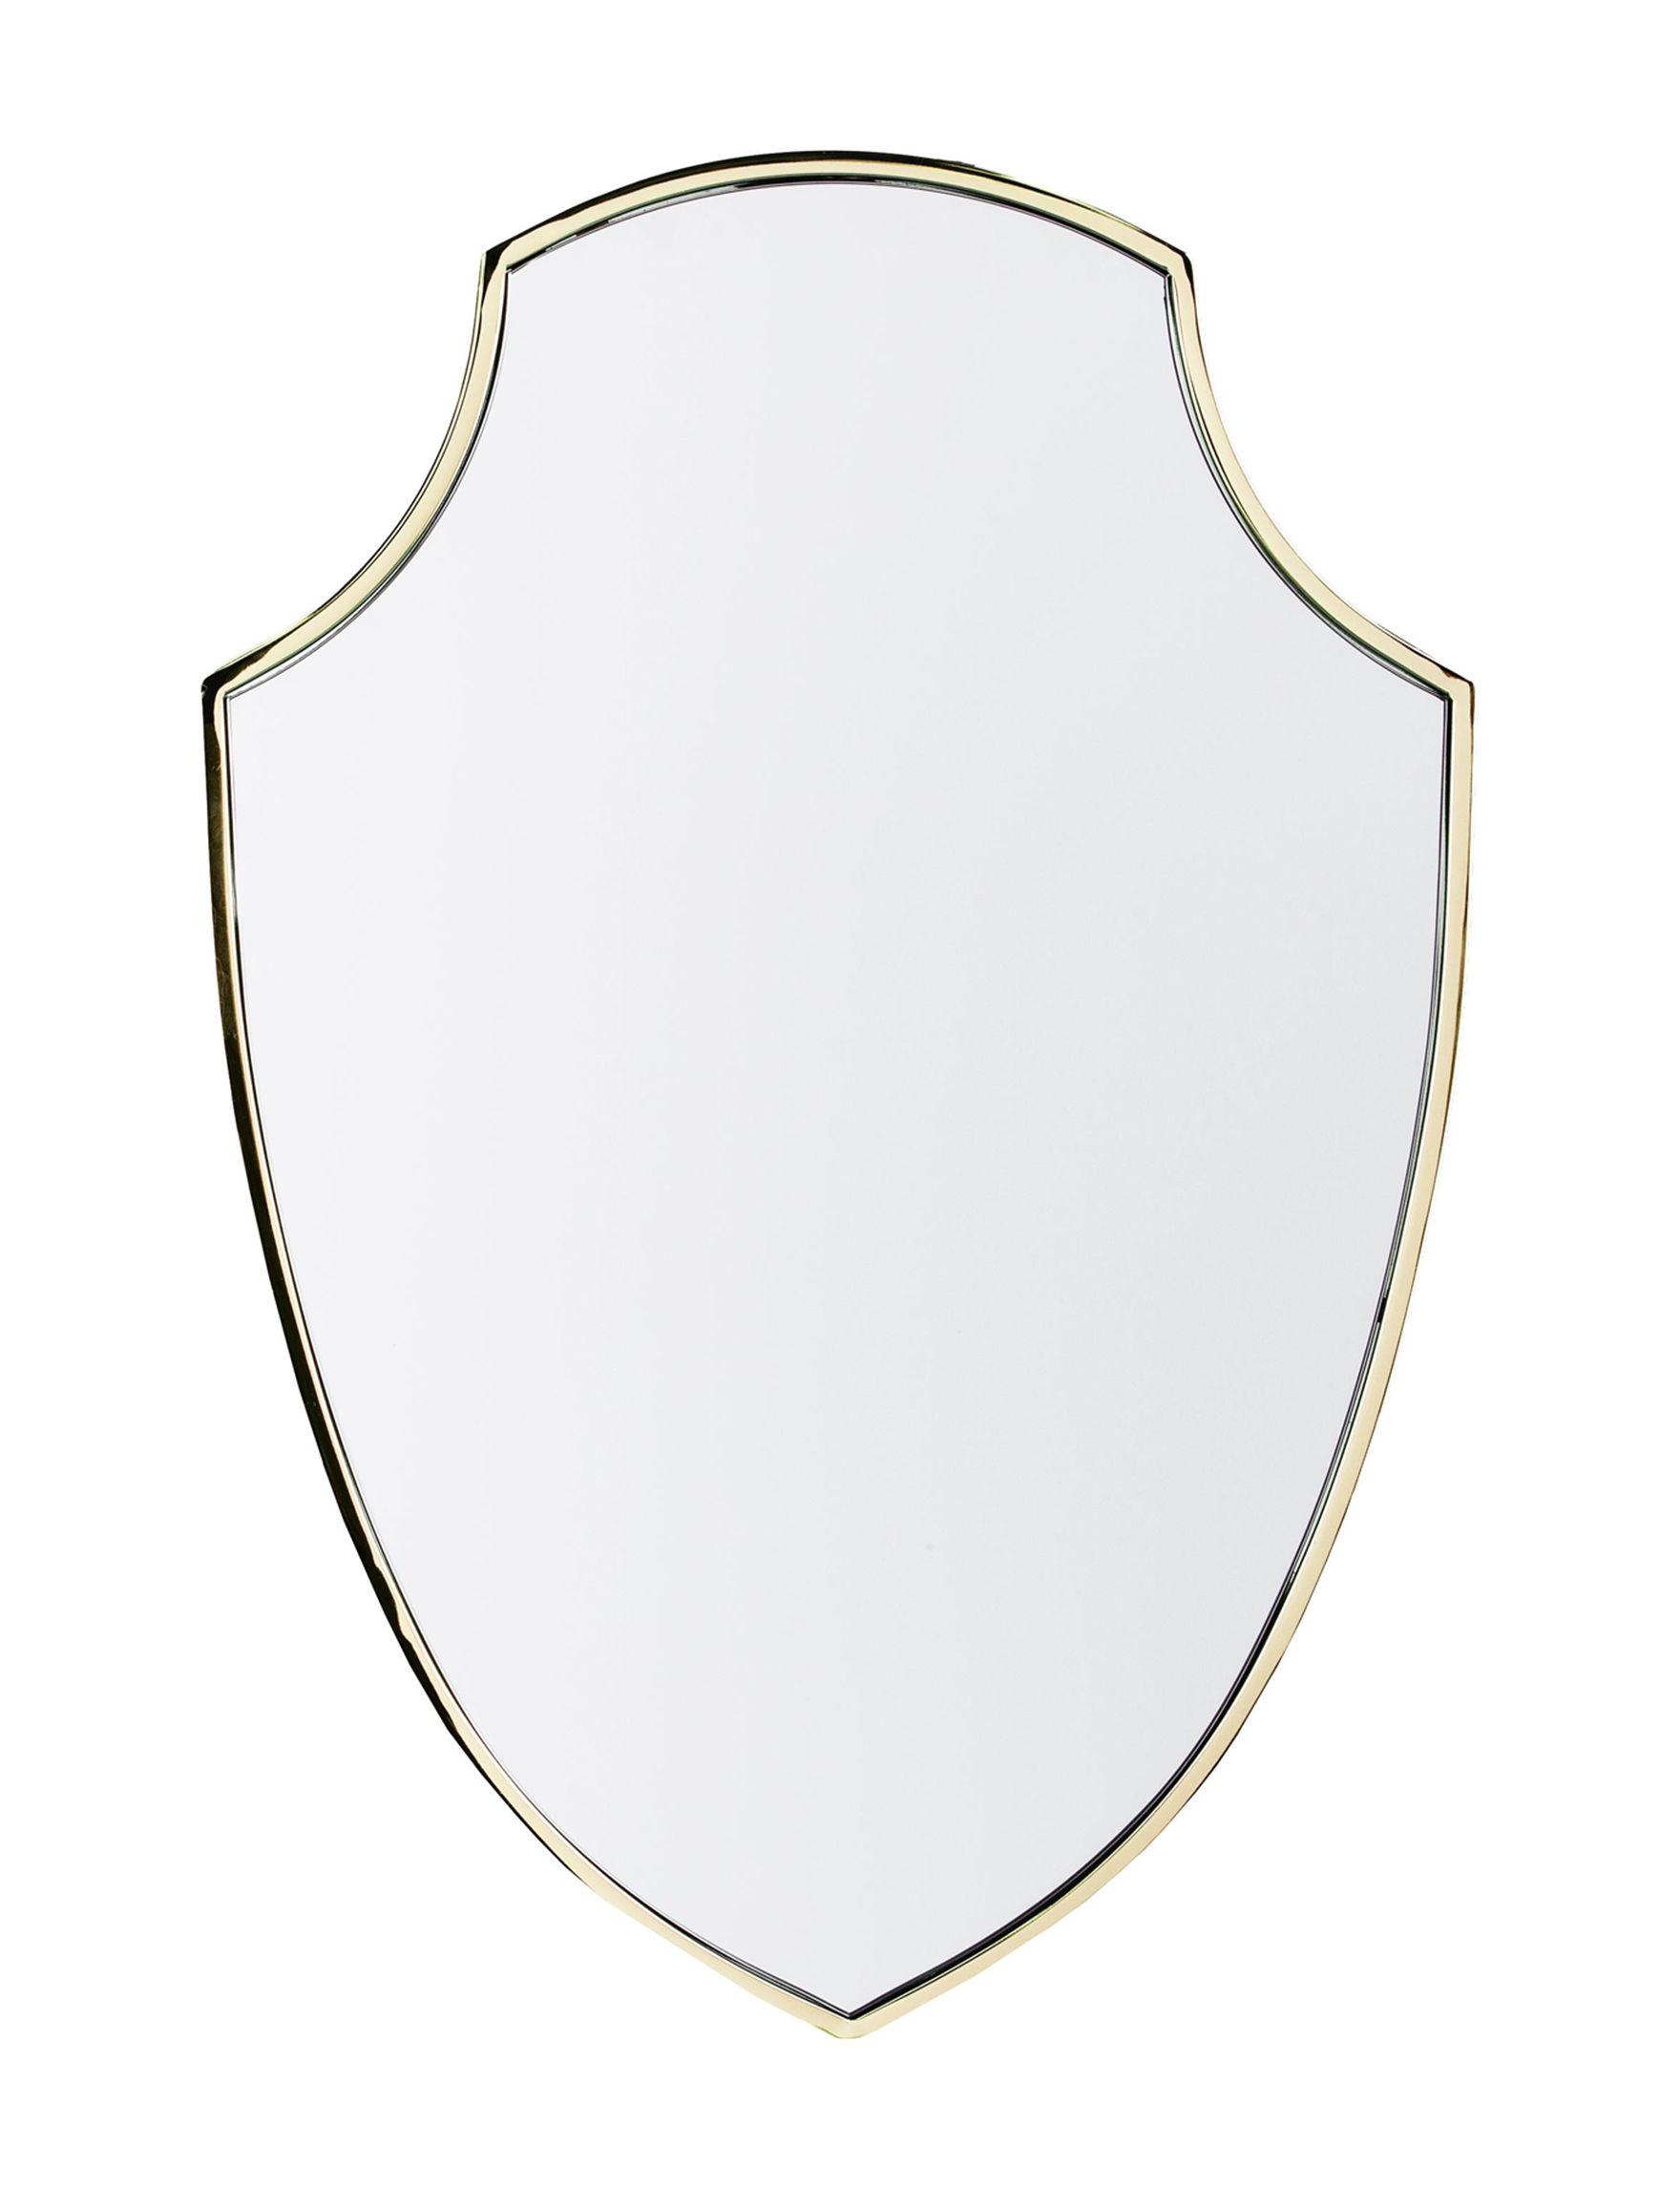 Southern Enterprises Gold Mirrors Wall Decor